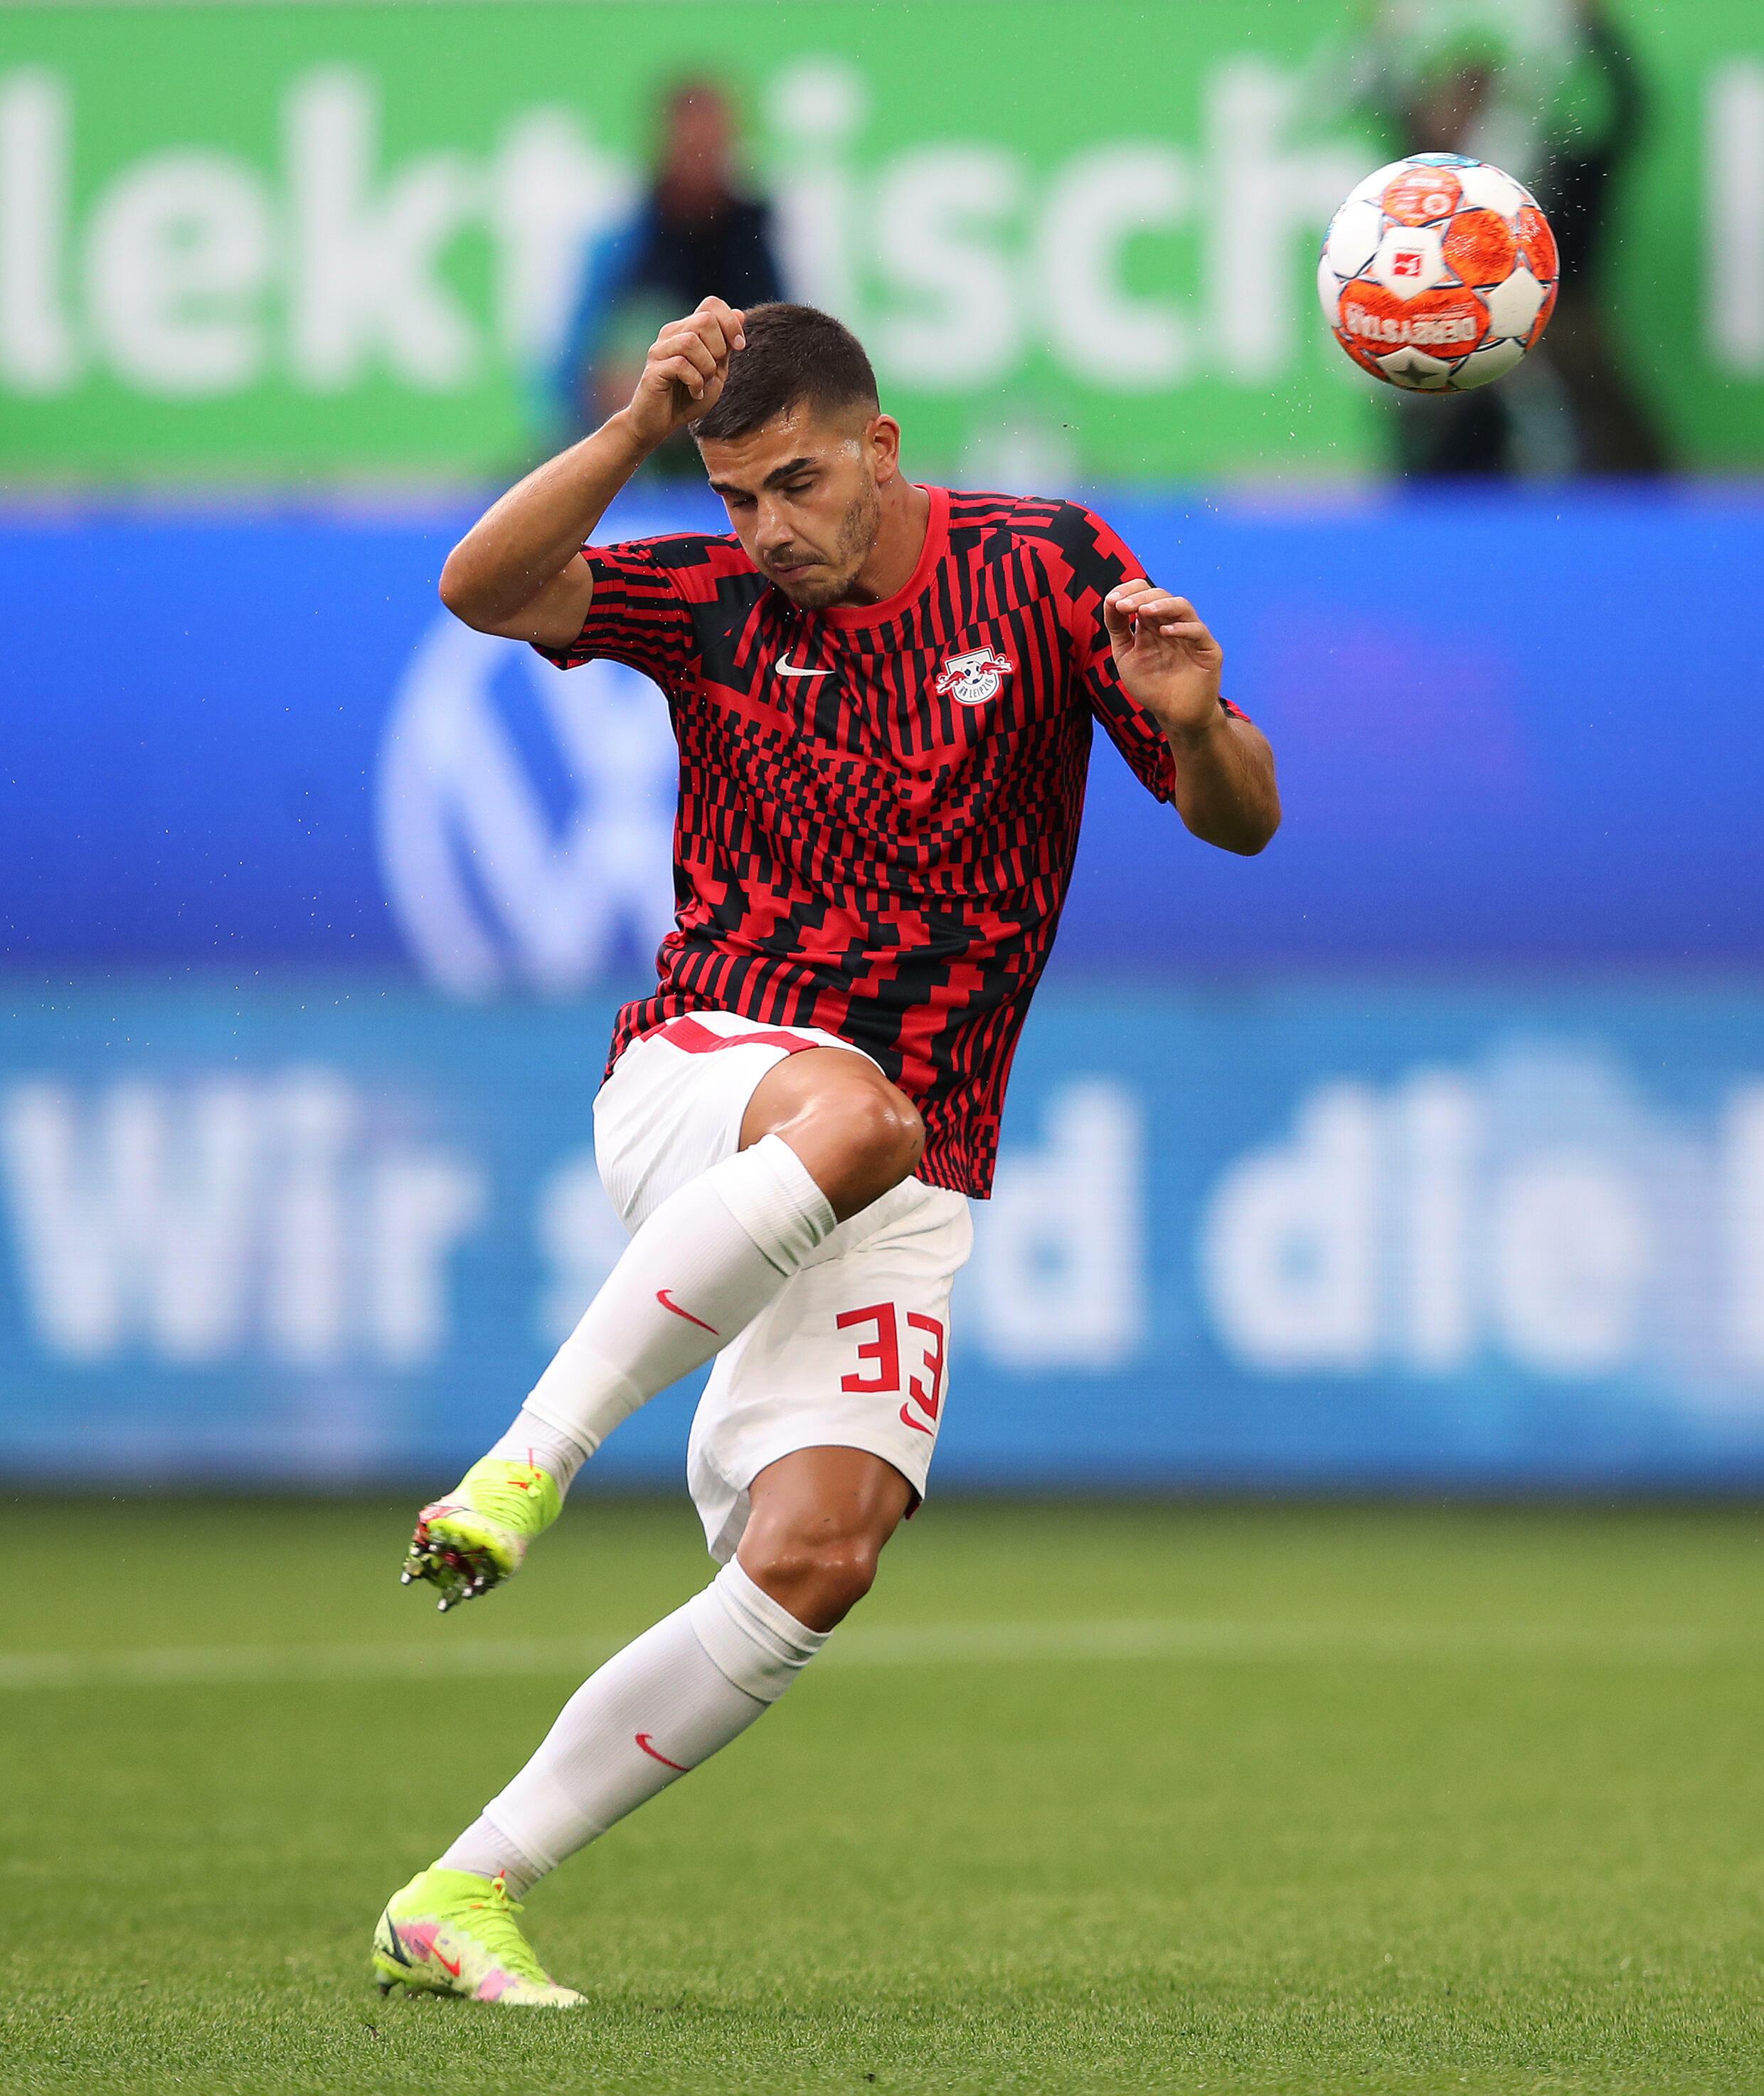 L'attaquant portugais Andre Silva ahd a marqué un but en sept matchs pour Leipzig